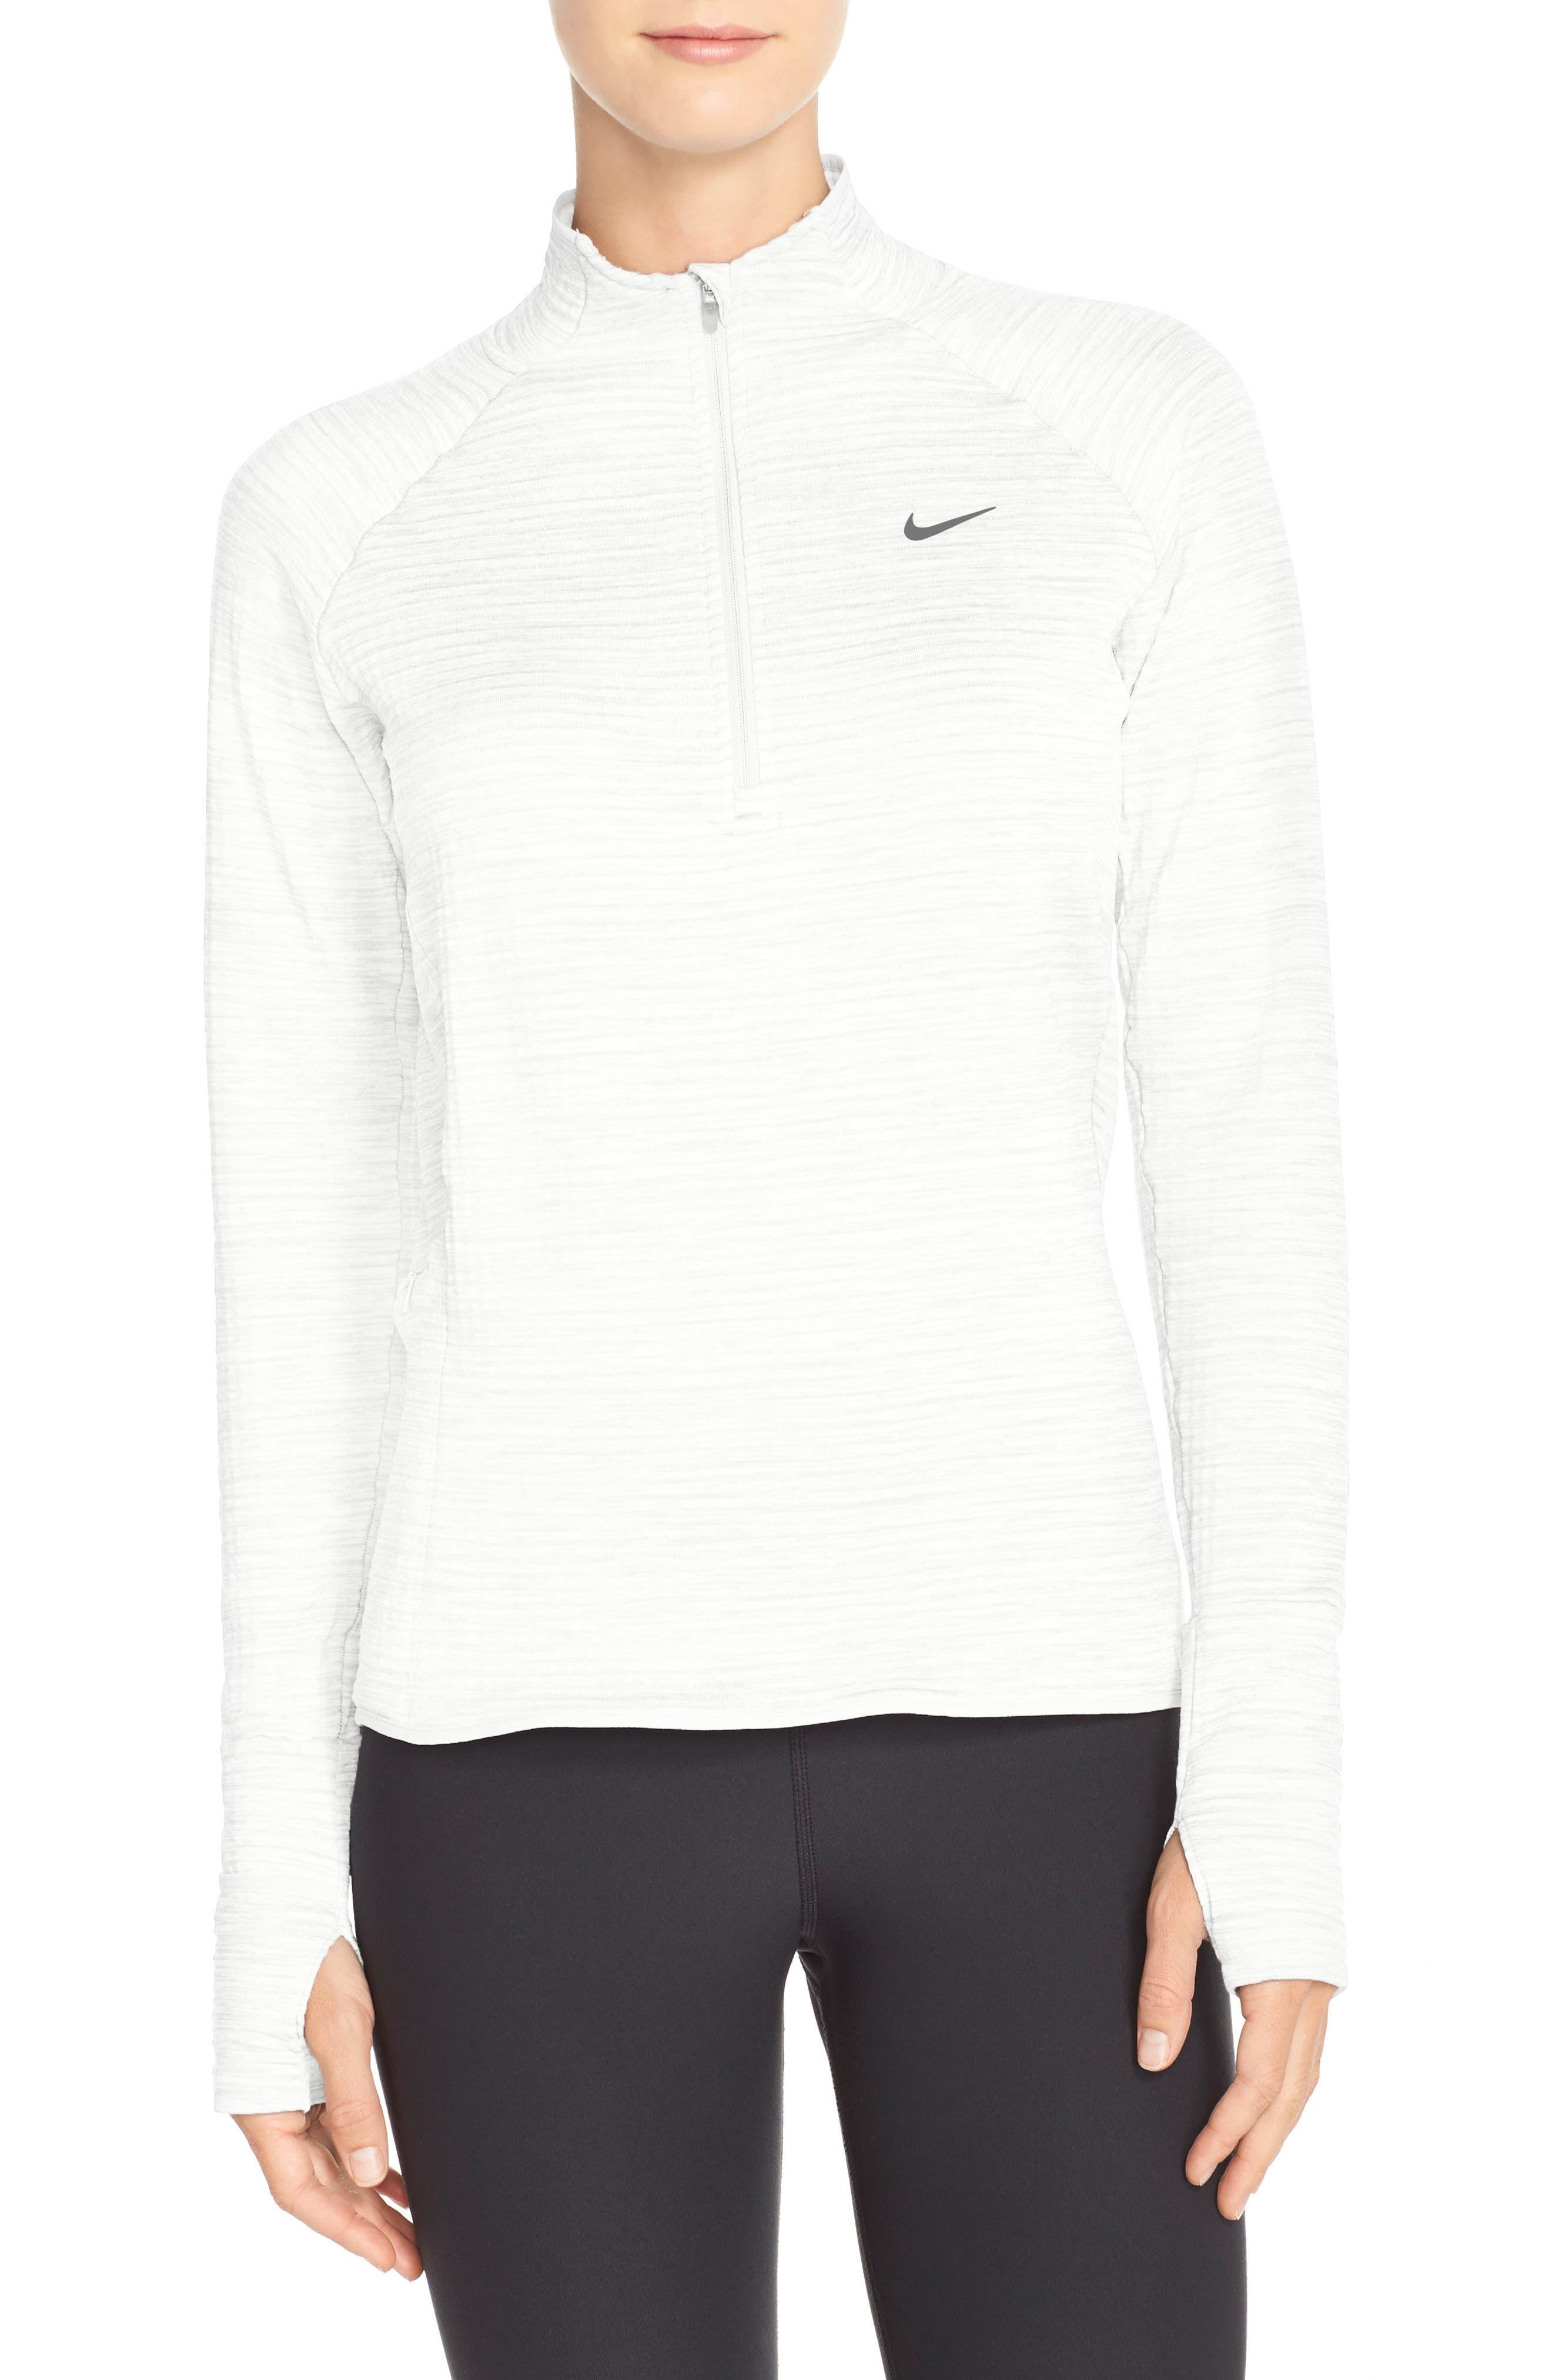 Alternate Image 1 Selected - Nike 'Element' Sphere Half Zip Running Shirt